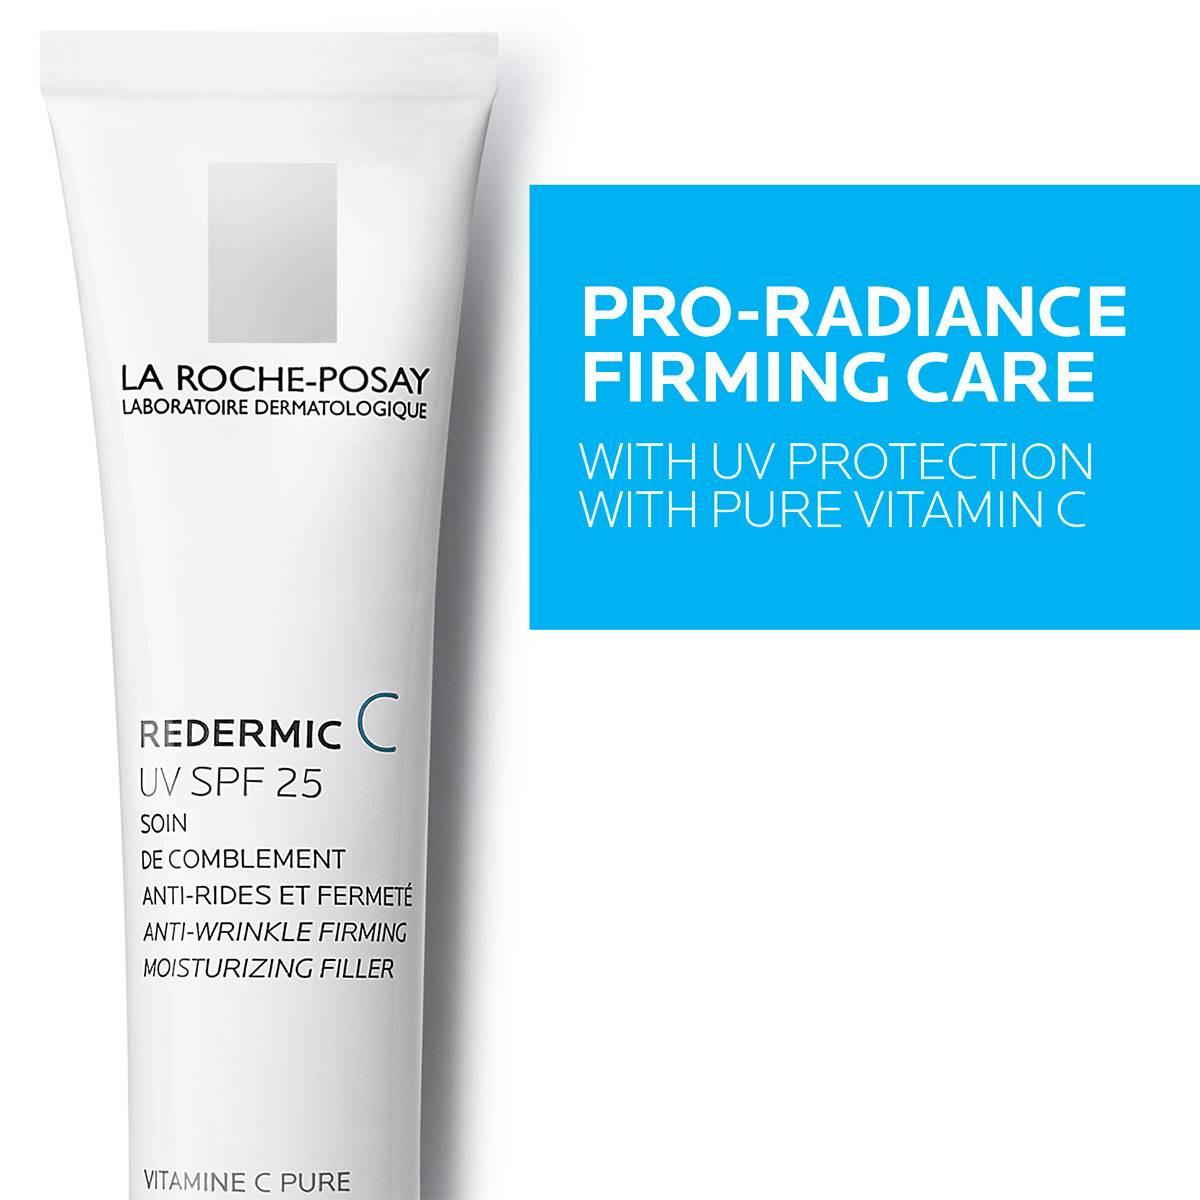 La Roche-Posay anti-wrinkles UV vitamin C